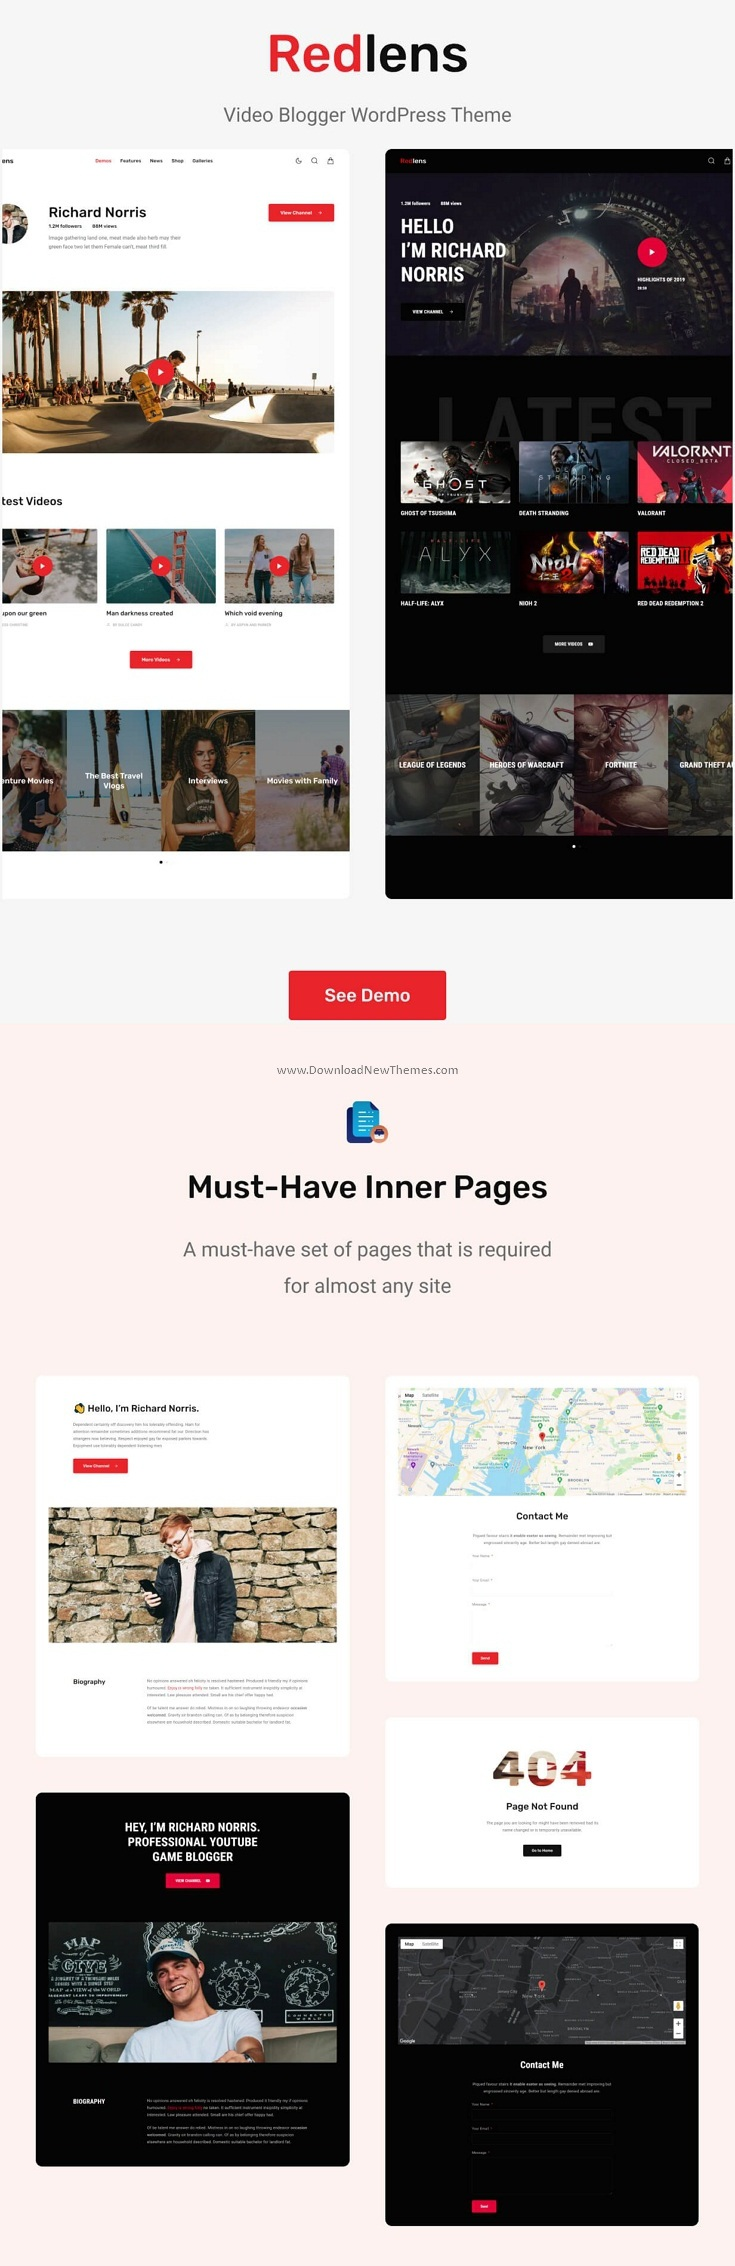 Video Blogger WordPress Theme